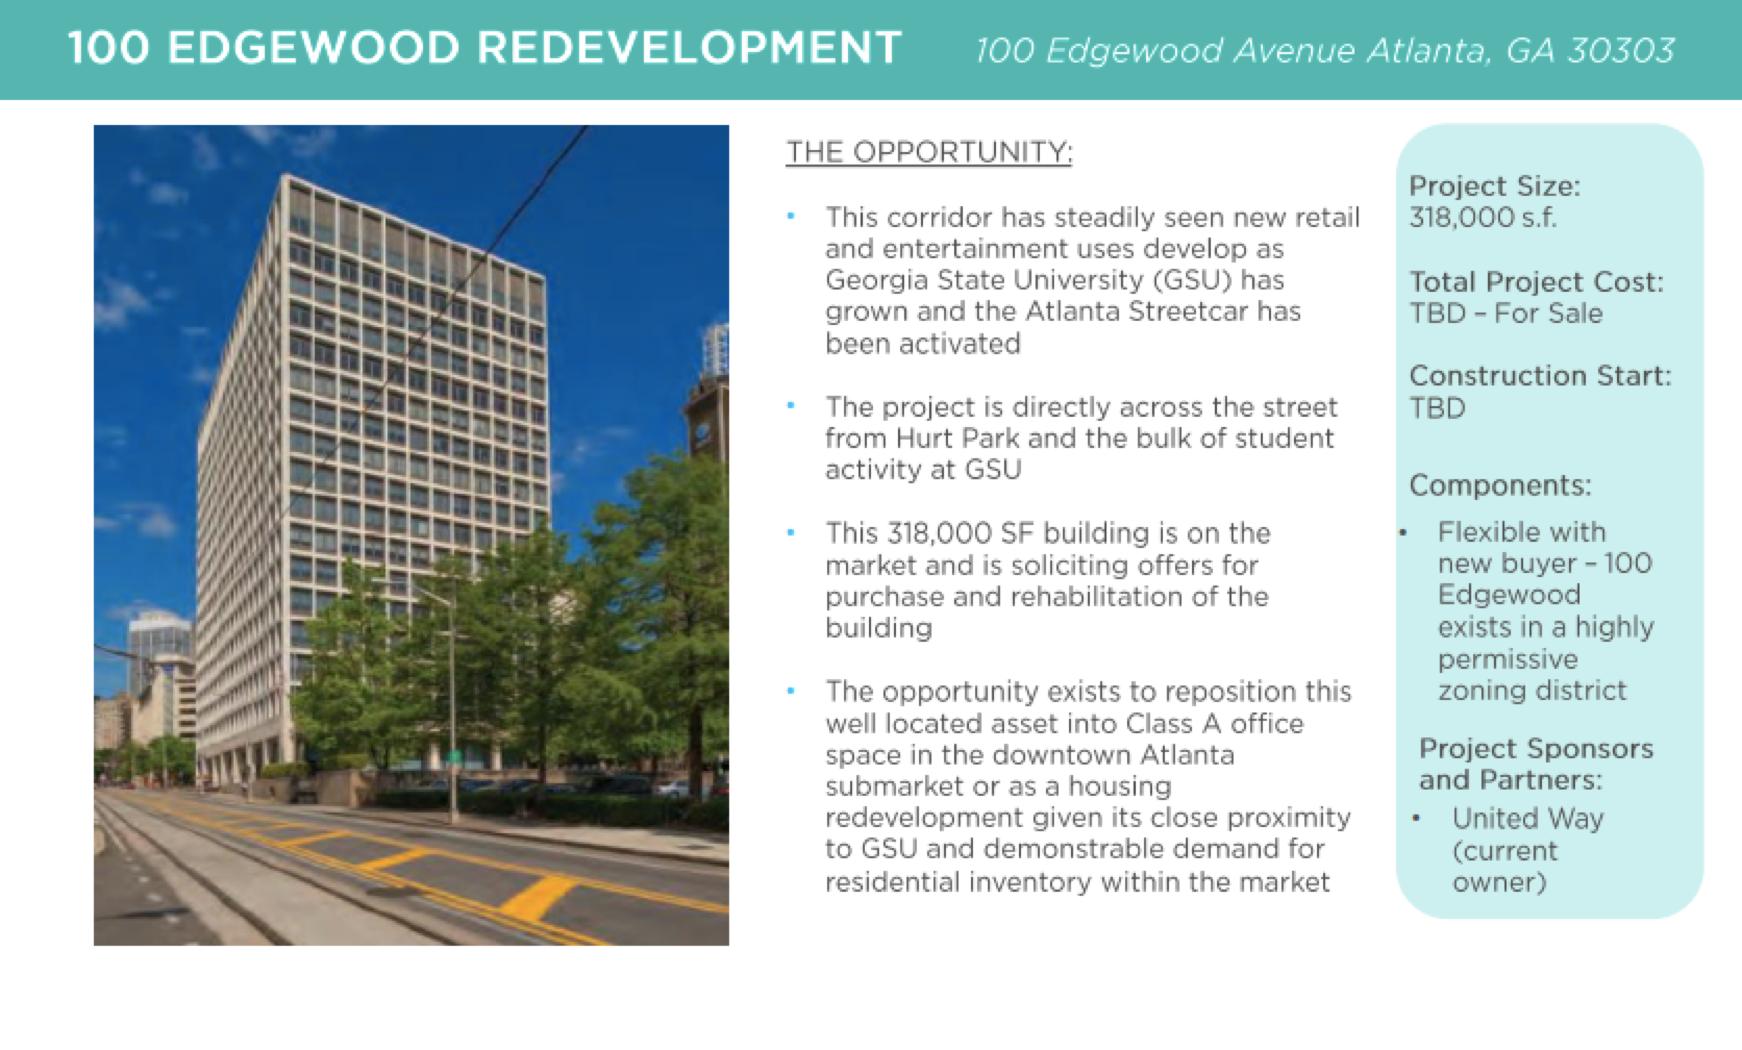 InvestAtlanta_100EdgewoodRedevelopment.png